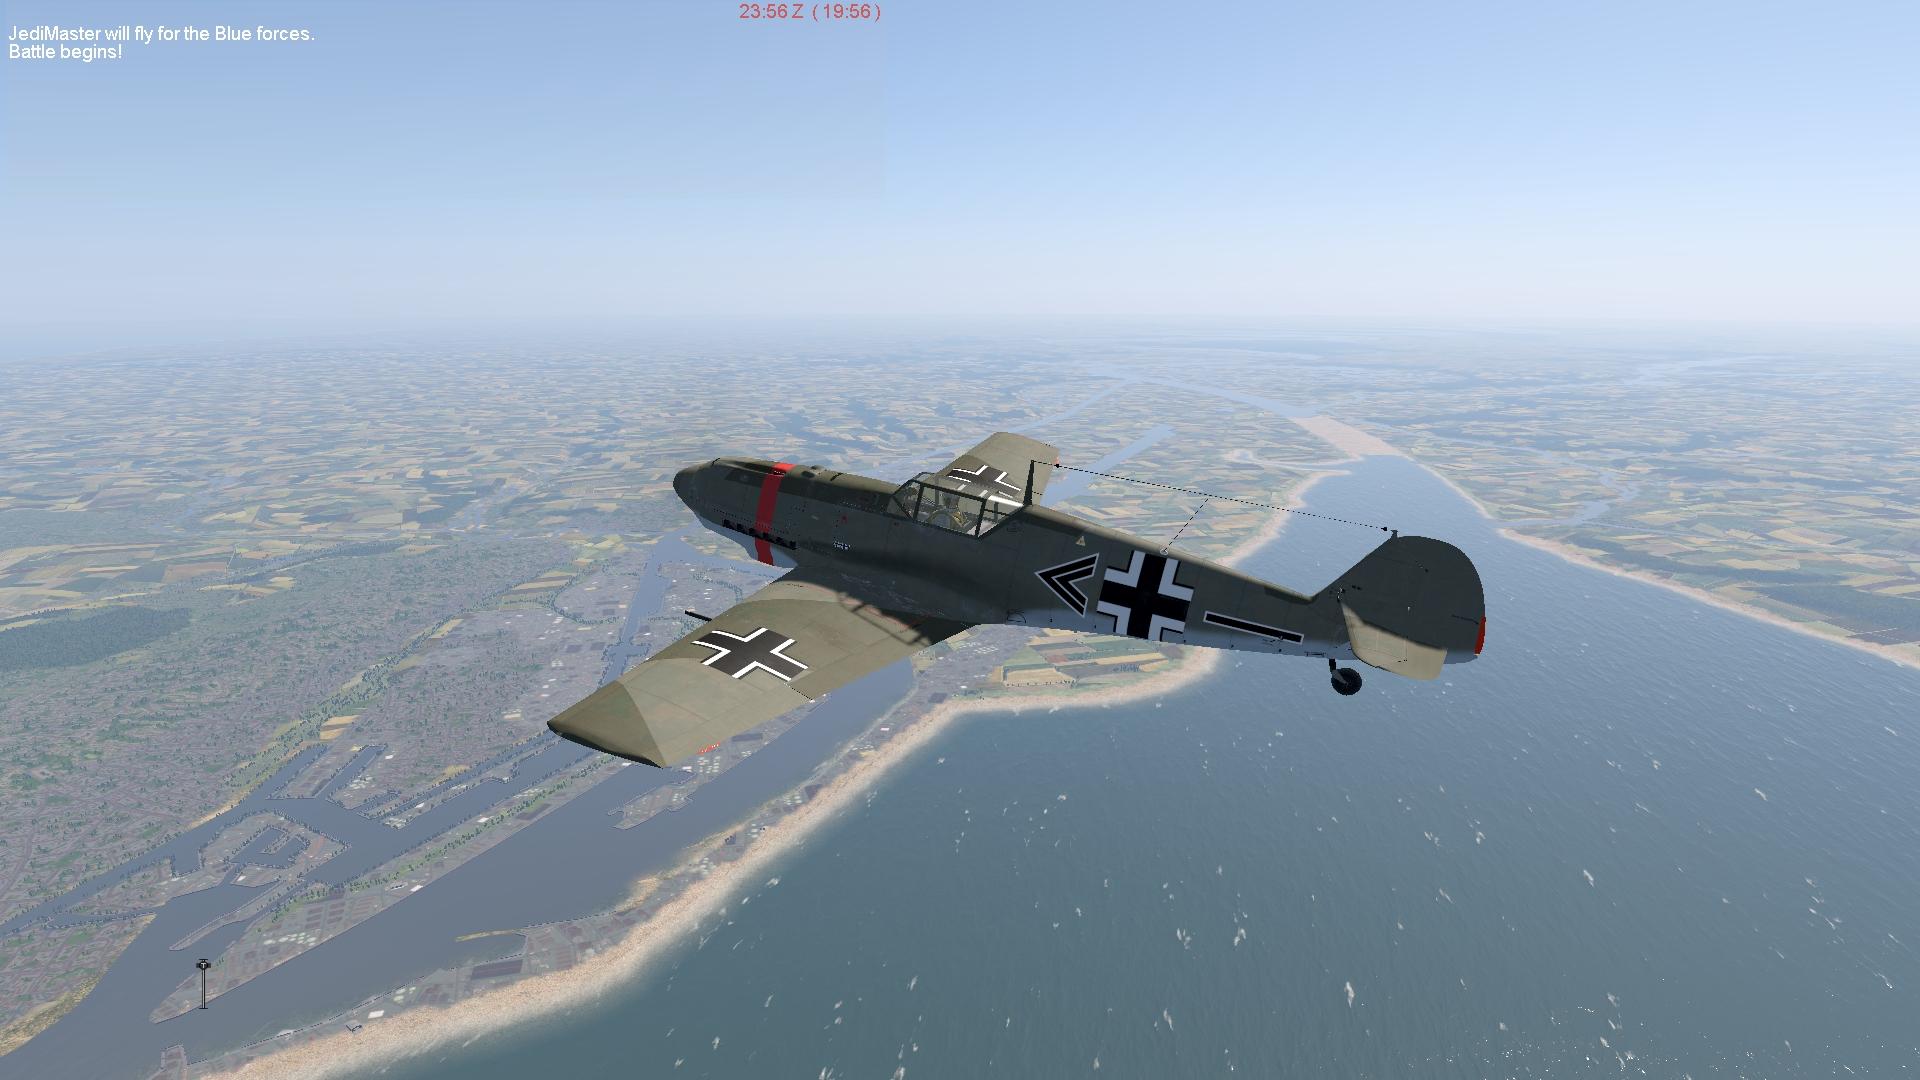 COD Bf109E over France 2